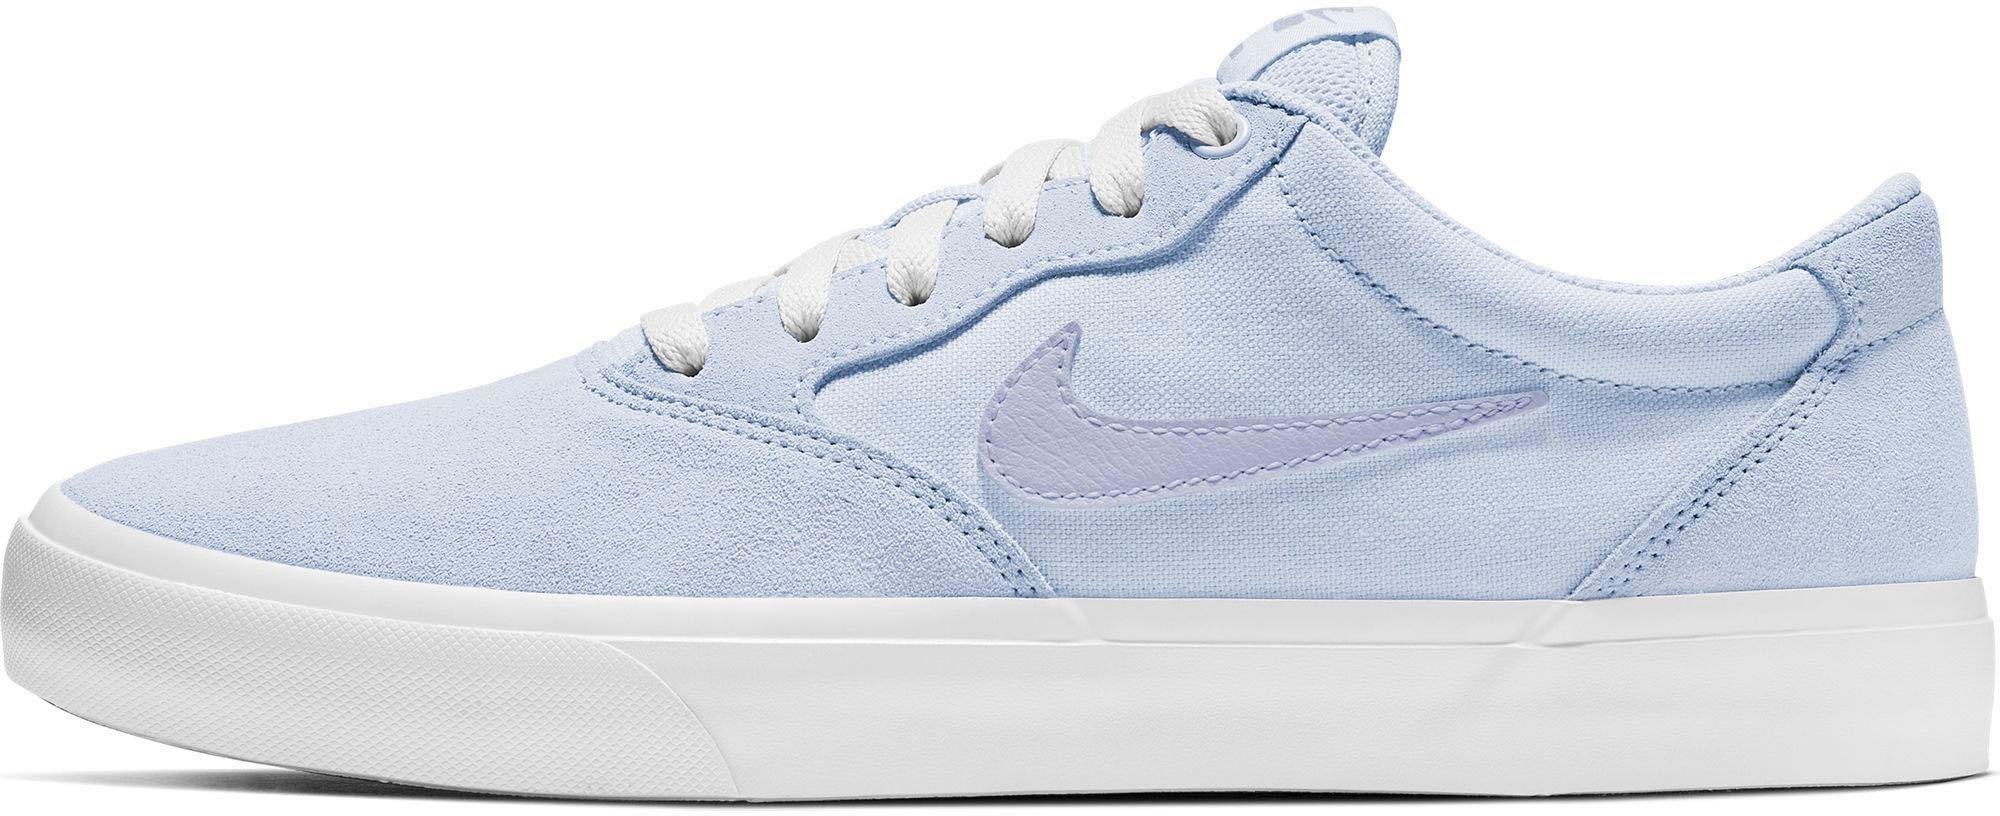 Nike SB Sneakers SB CHRON SOLARSOFT - verschillende betaalmethodes